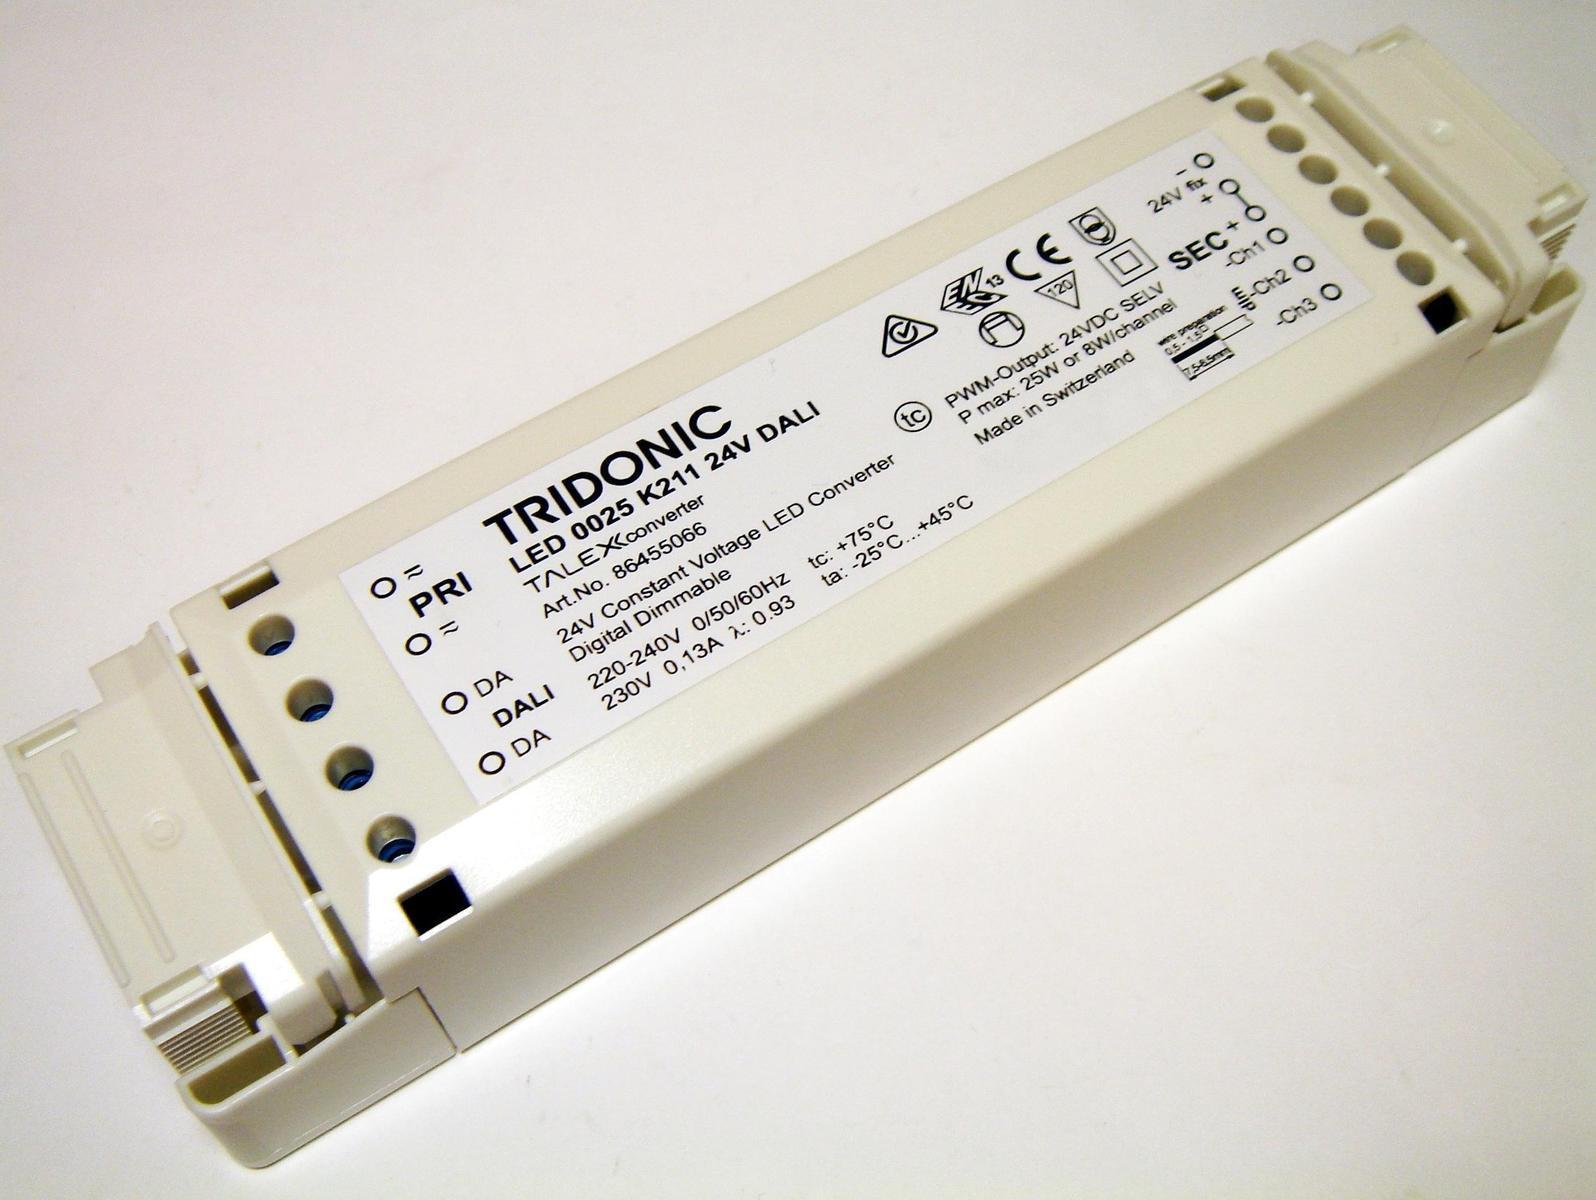 Elektrooniline  LED  trafo 25W, 24V DC, Tridonic, LED 0025 K211 24V DALI, 86455066